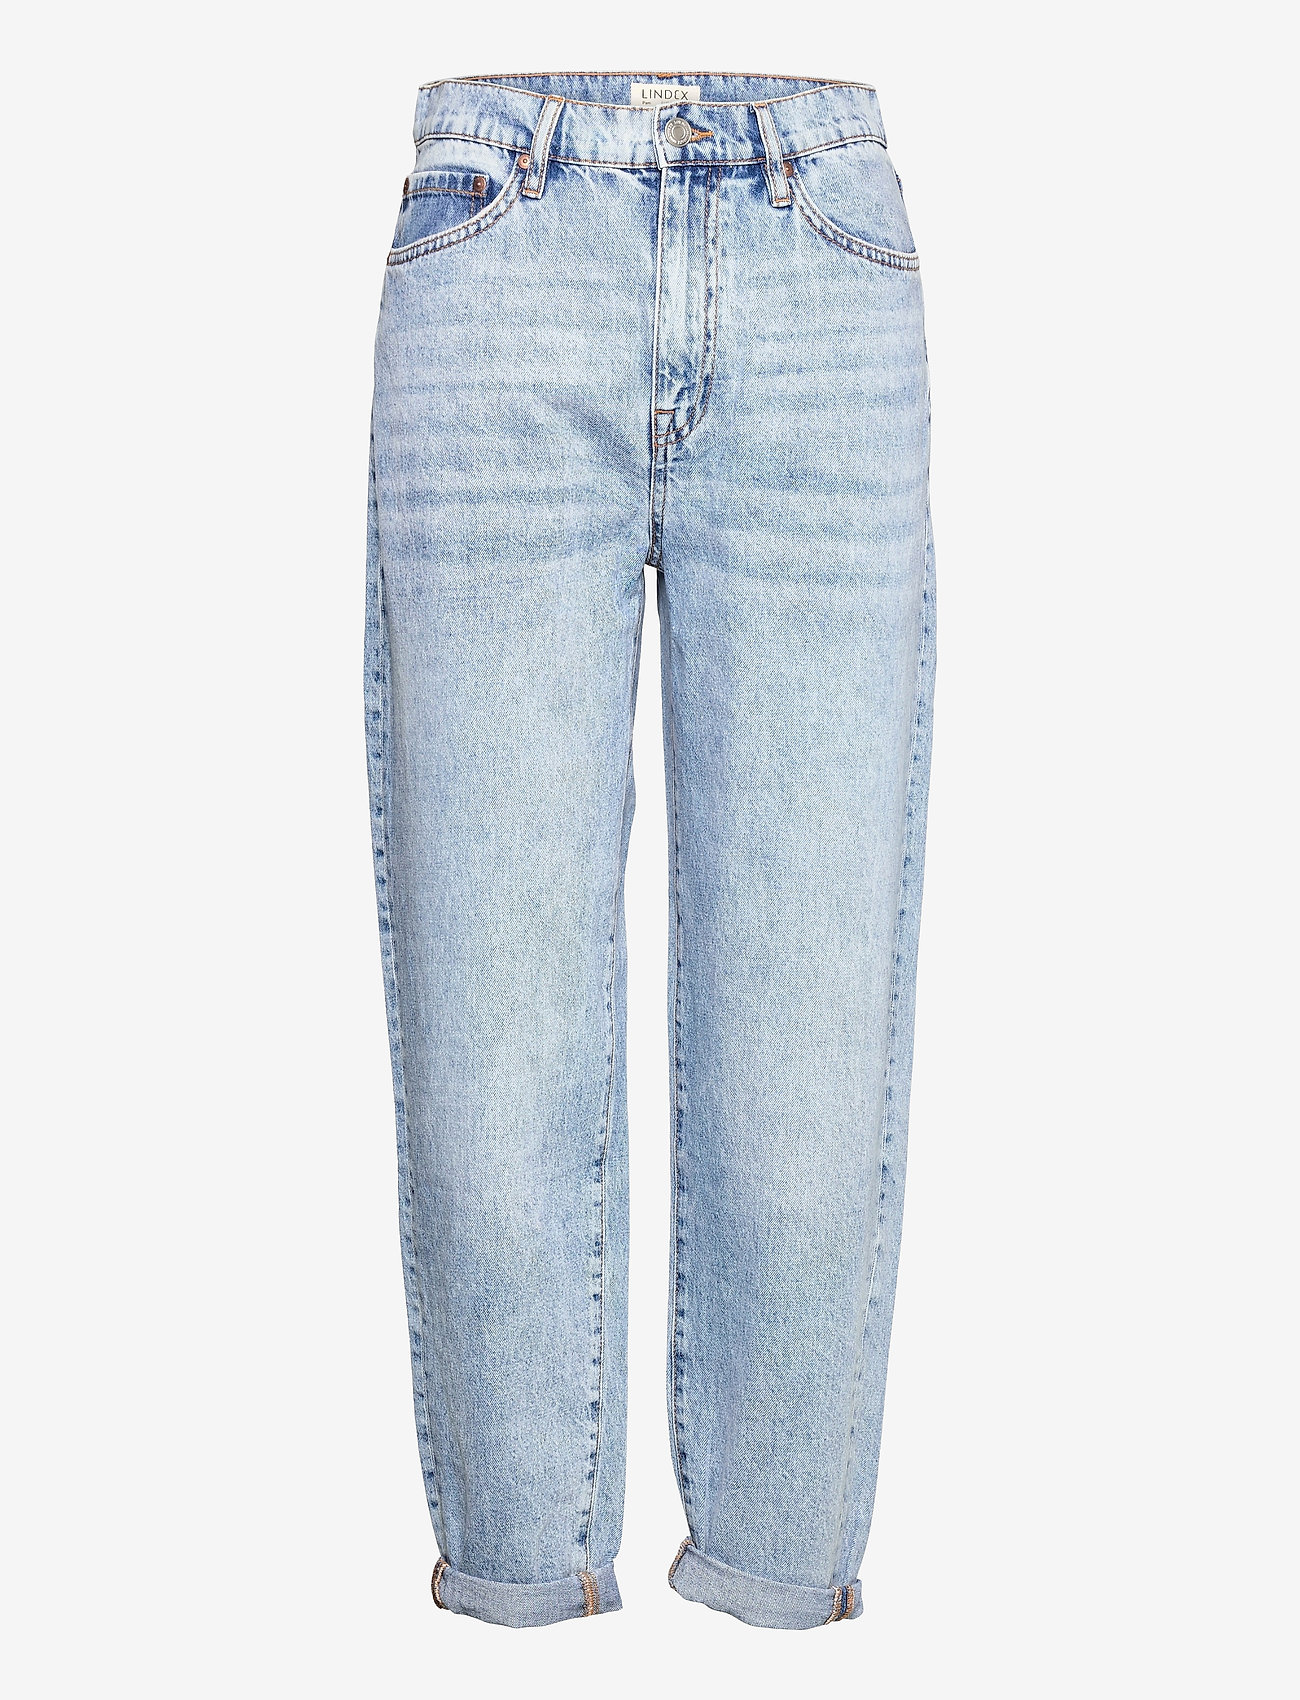 Lindex - Trousers denim Pam blue - mom-jeans - blue - 0